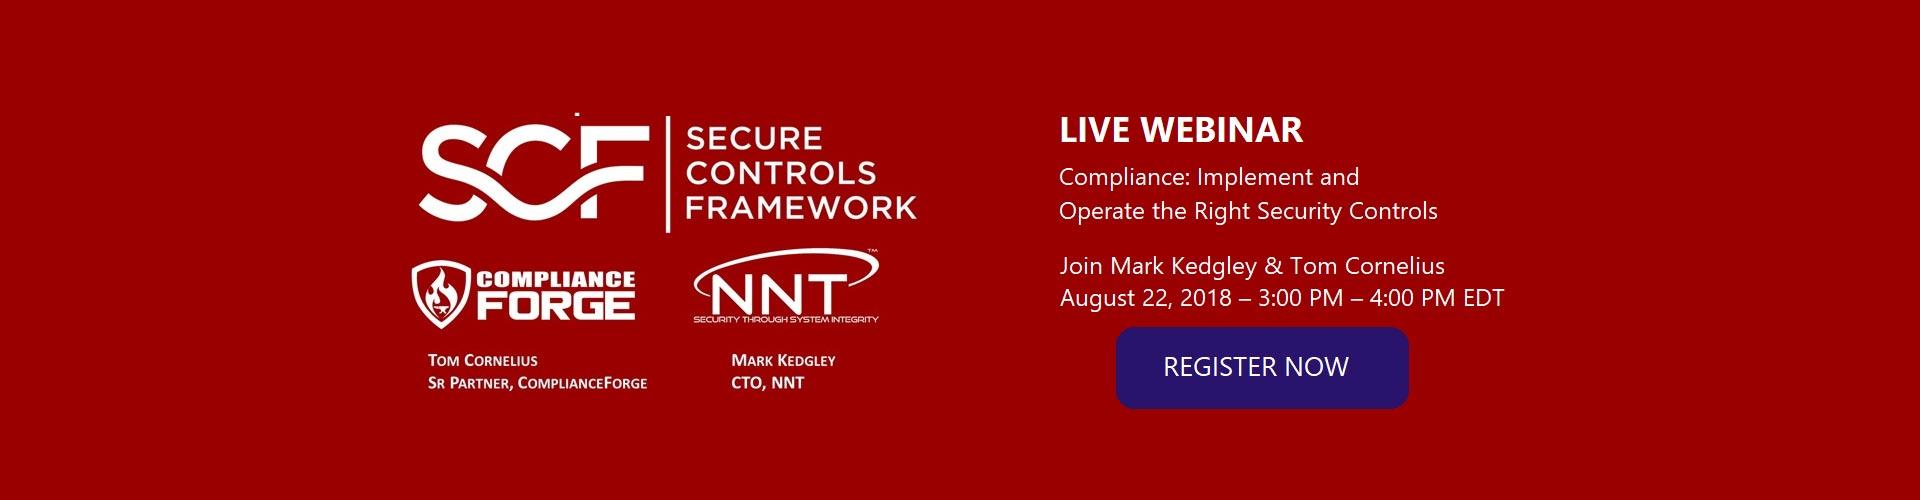 NNTCcomplianceForgeWebinarBanner-002